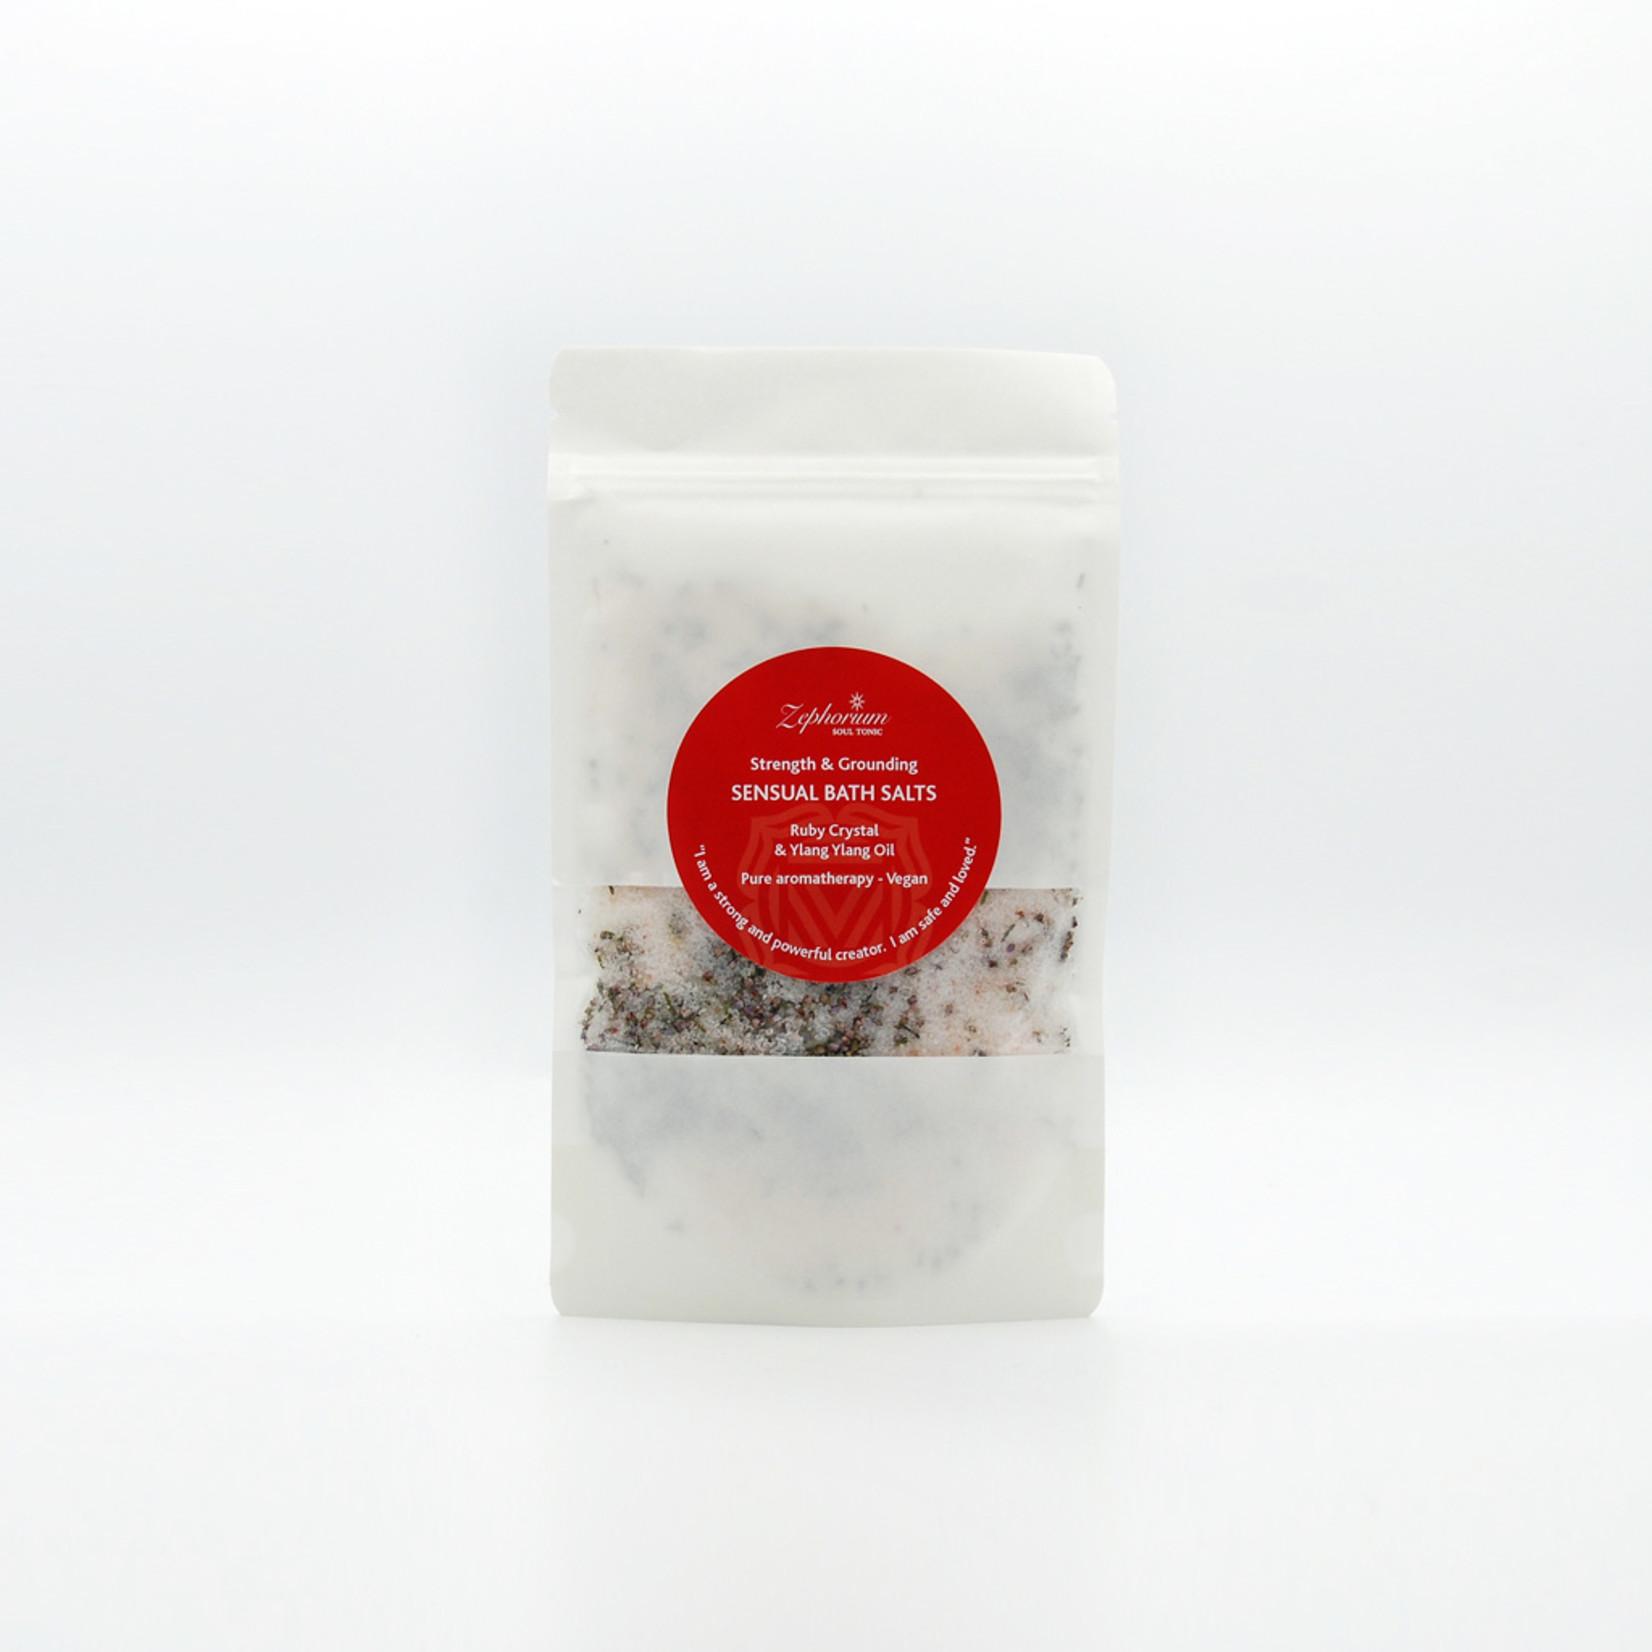 Zephorium Sensual bath salts - ruby